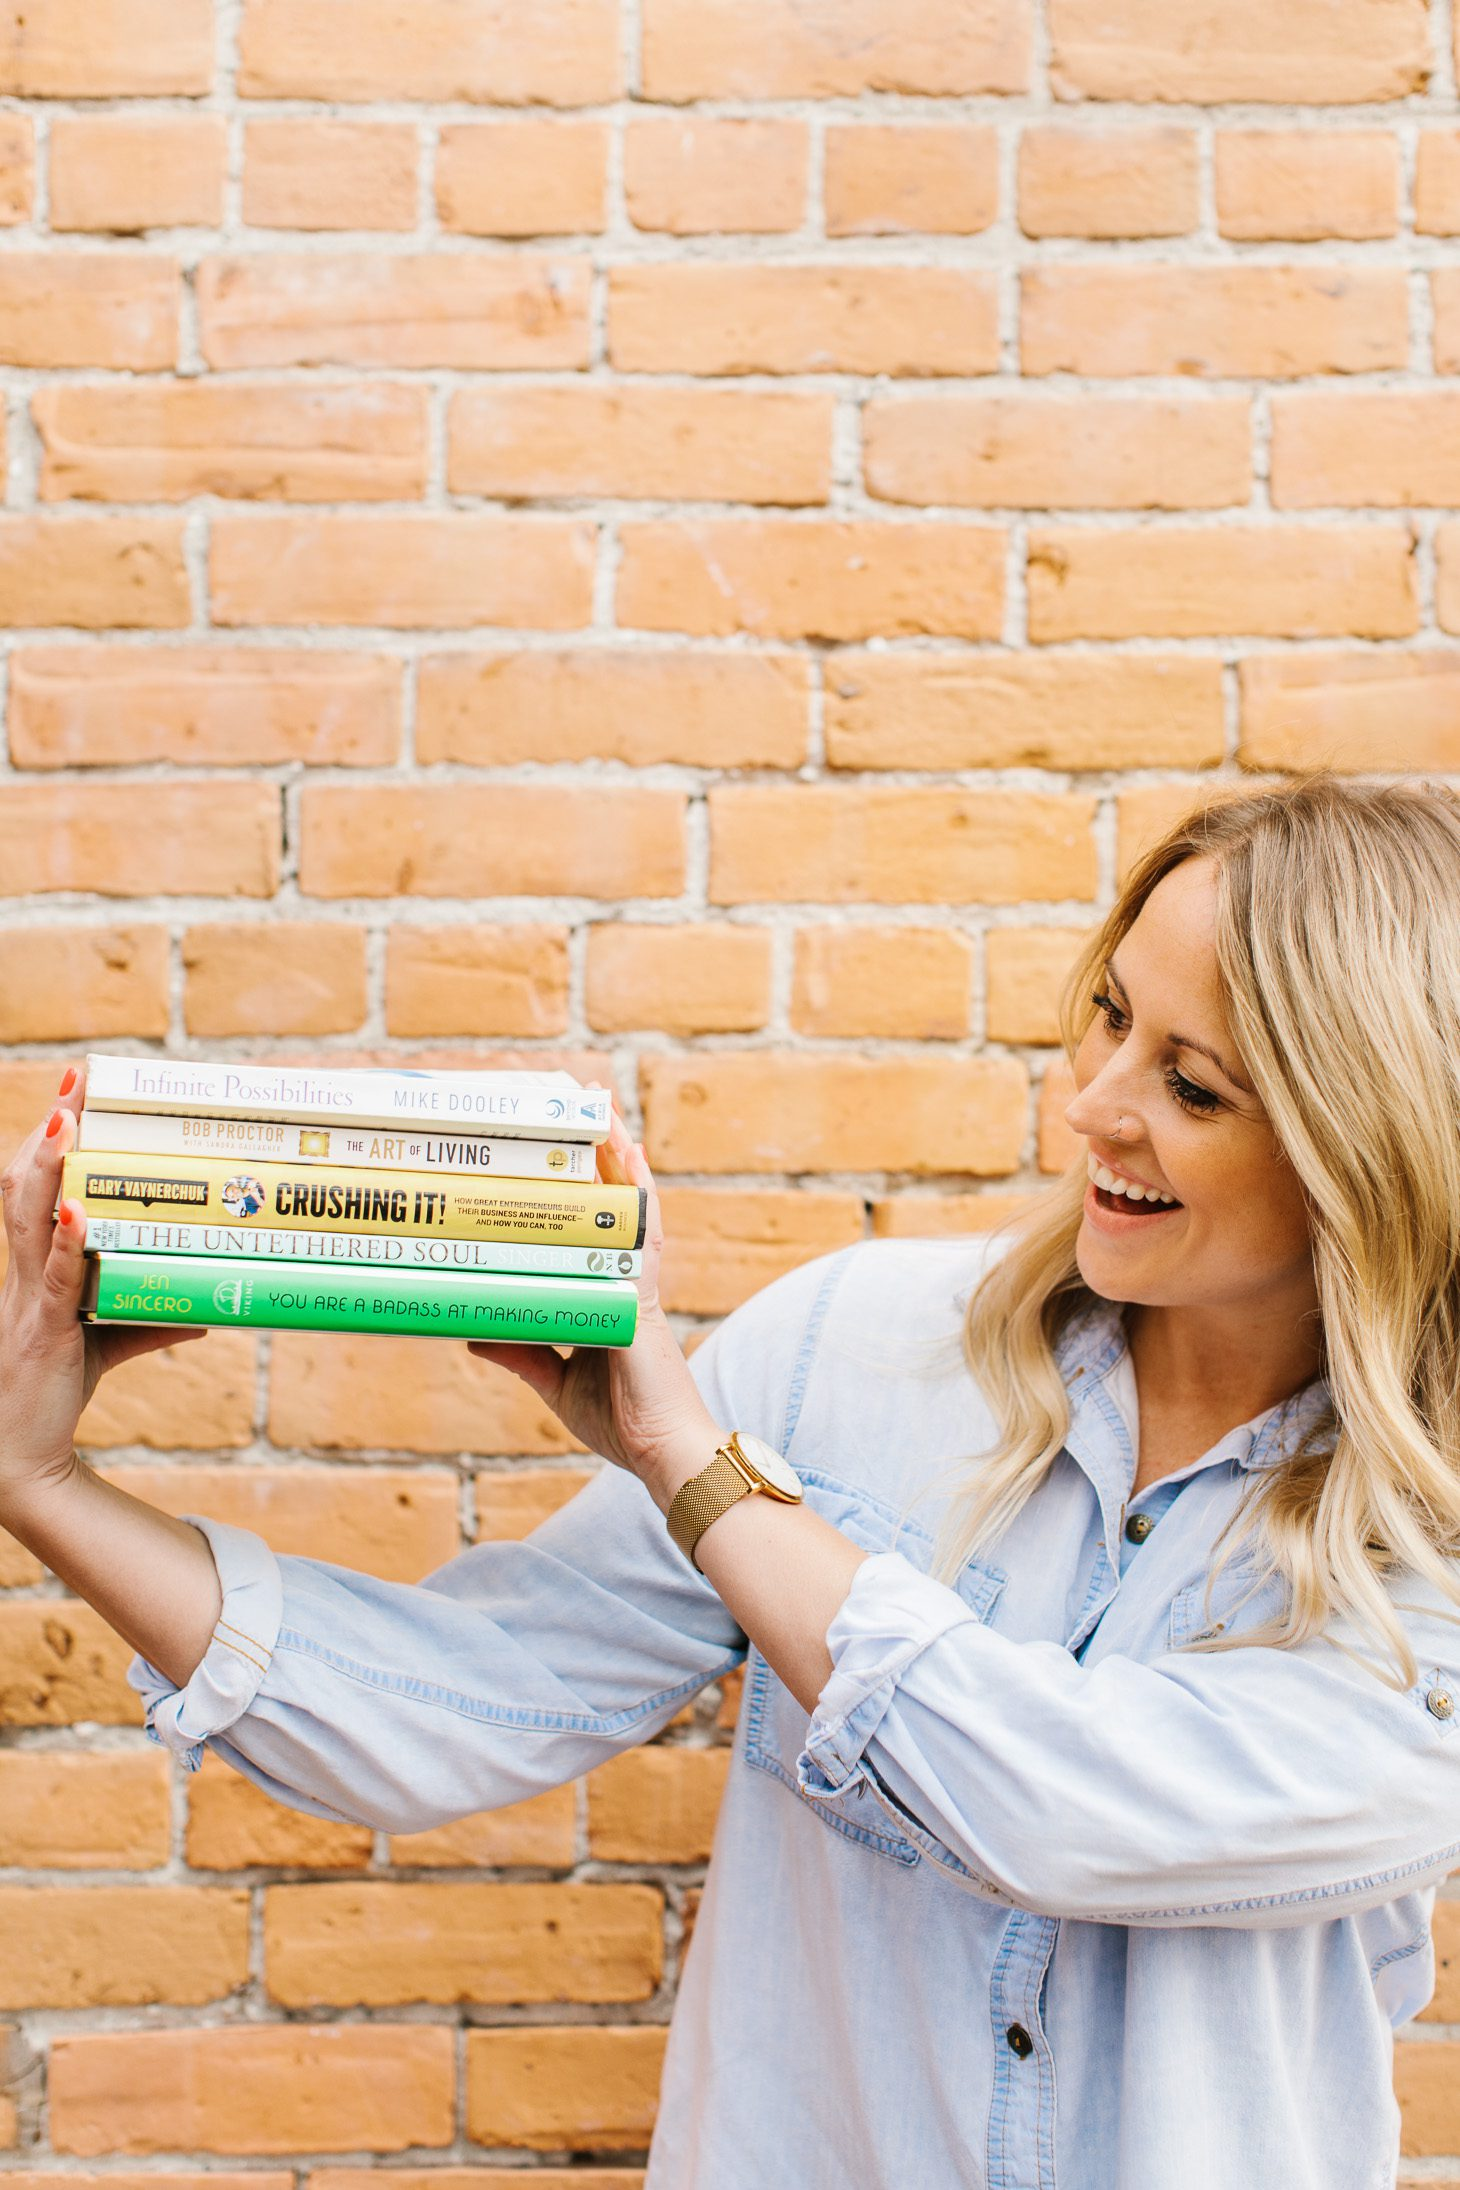 Jillian Harris Top 5 Books for Personal Growth